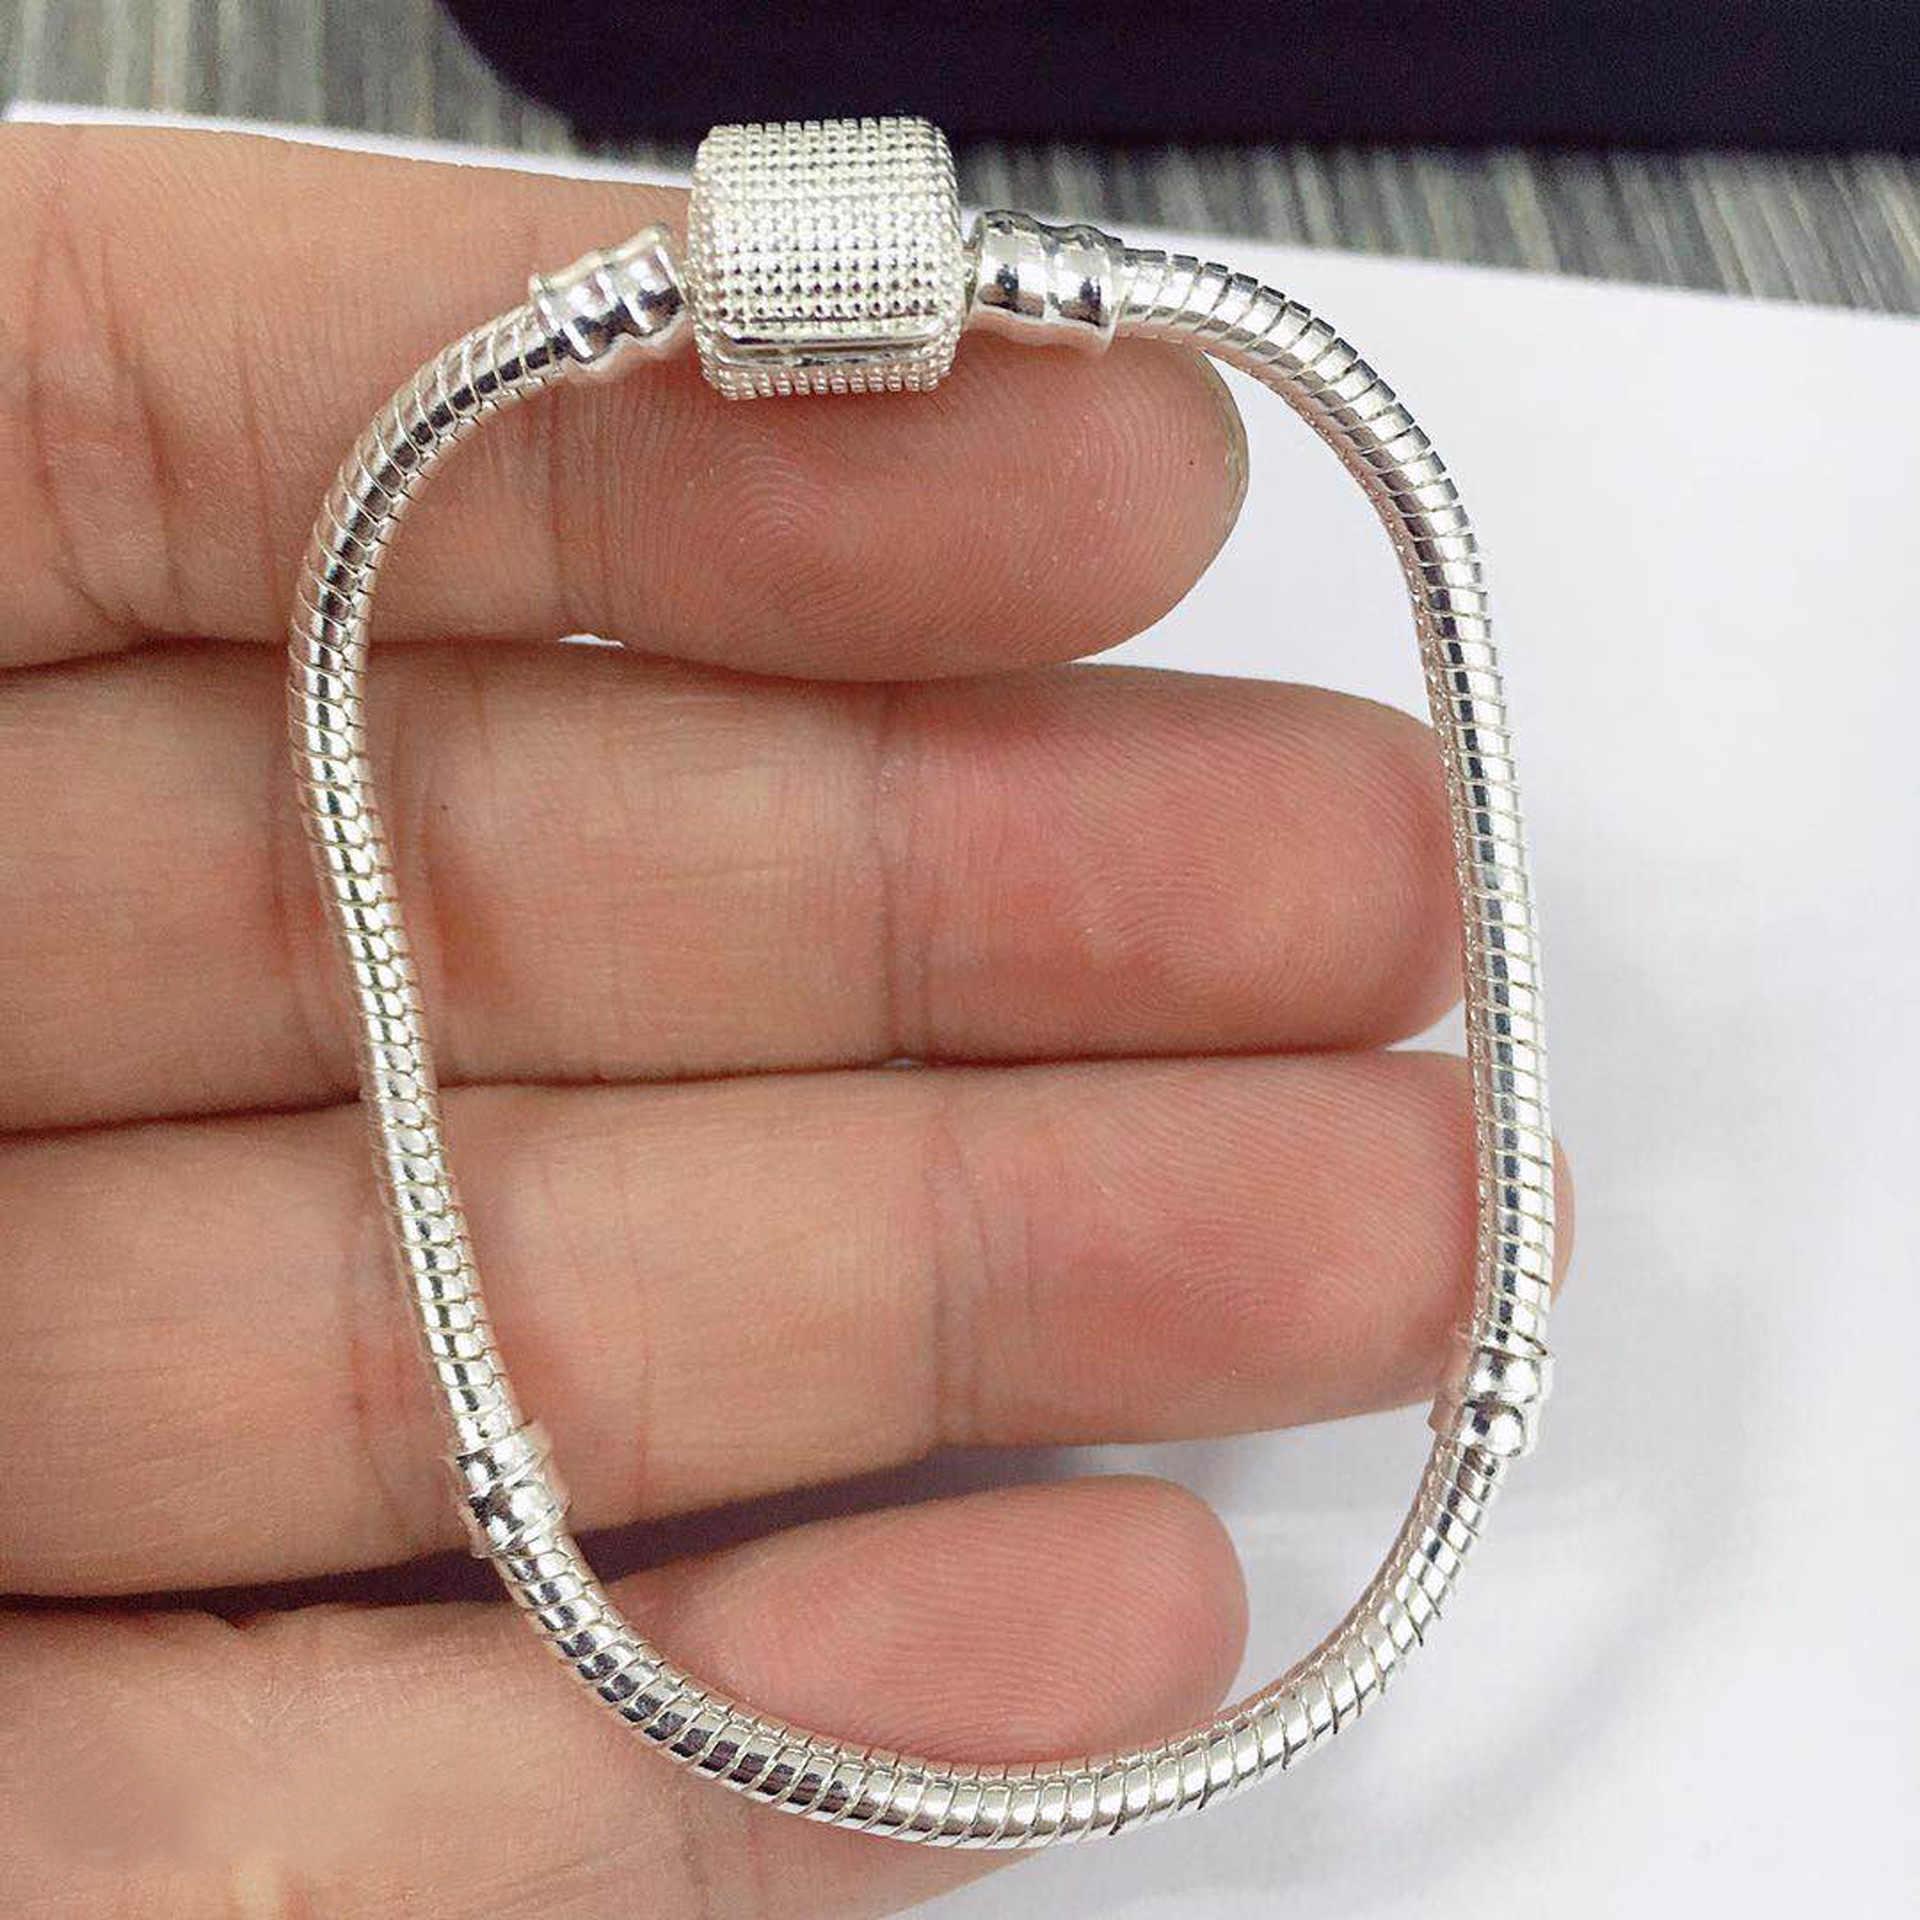 90% OFF ขายใหญ่ 925 Sterling Silver Charm สร้อยข้อมือสำหรับผู้หญิง DIY เครื่องประดับสร้อยข้อมือกระดูกกำไลข้อมือทำของขวัญ